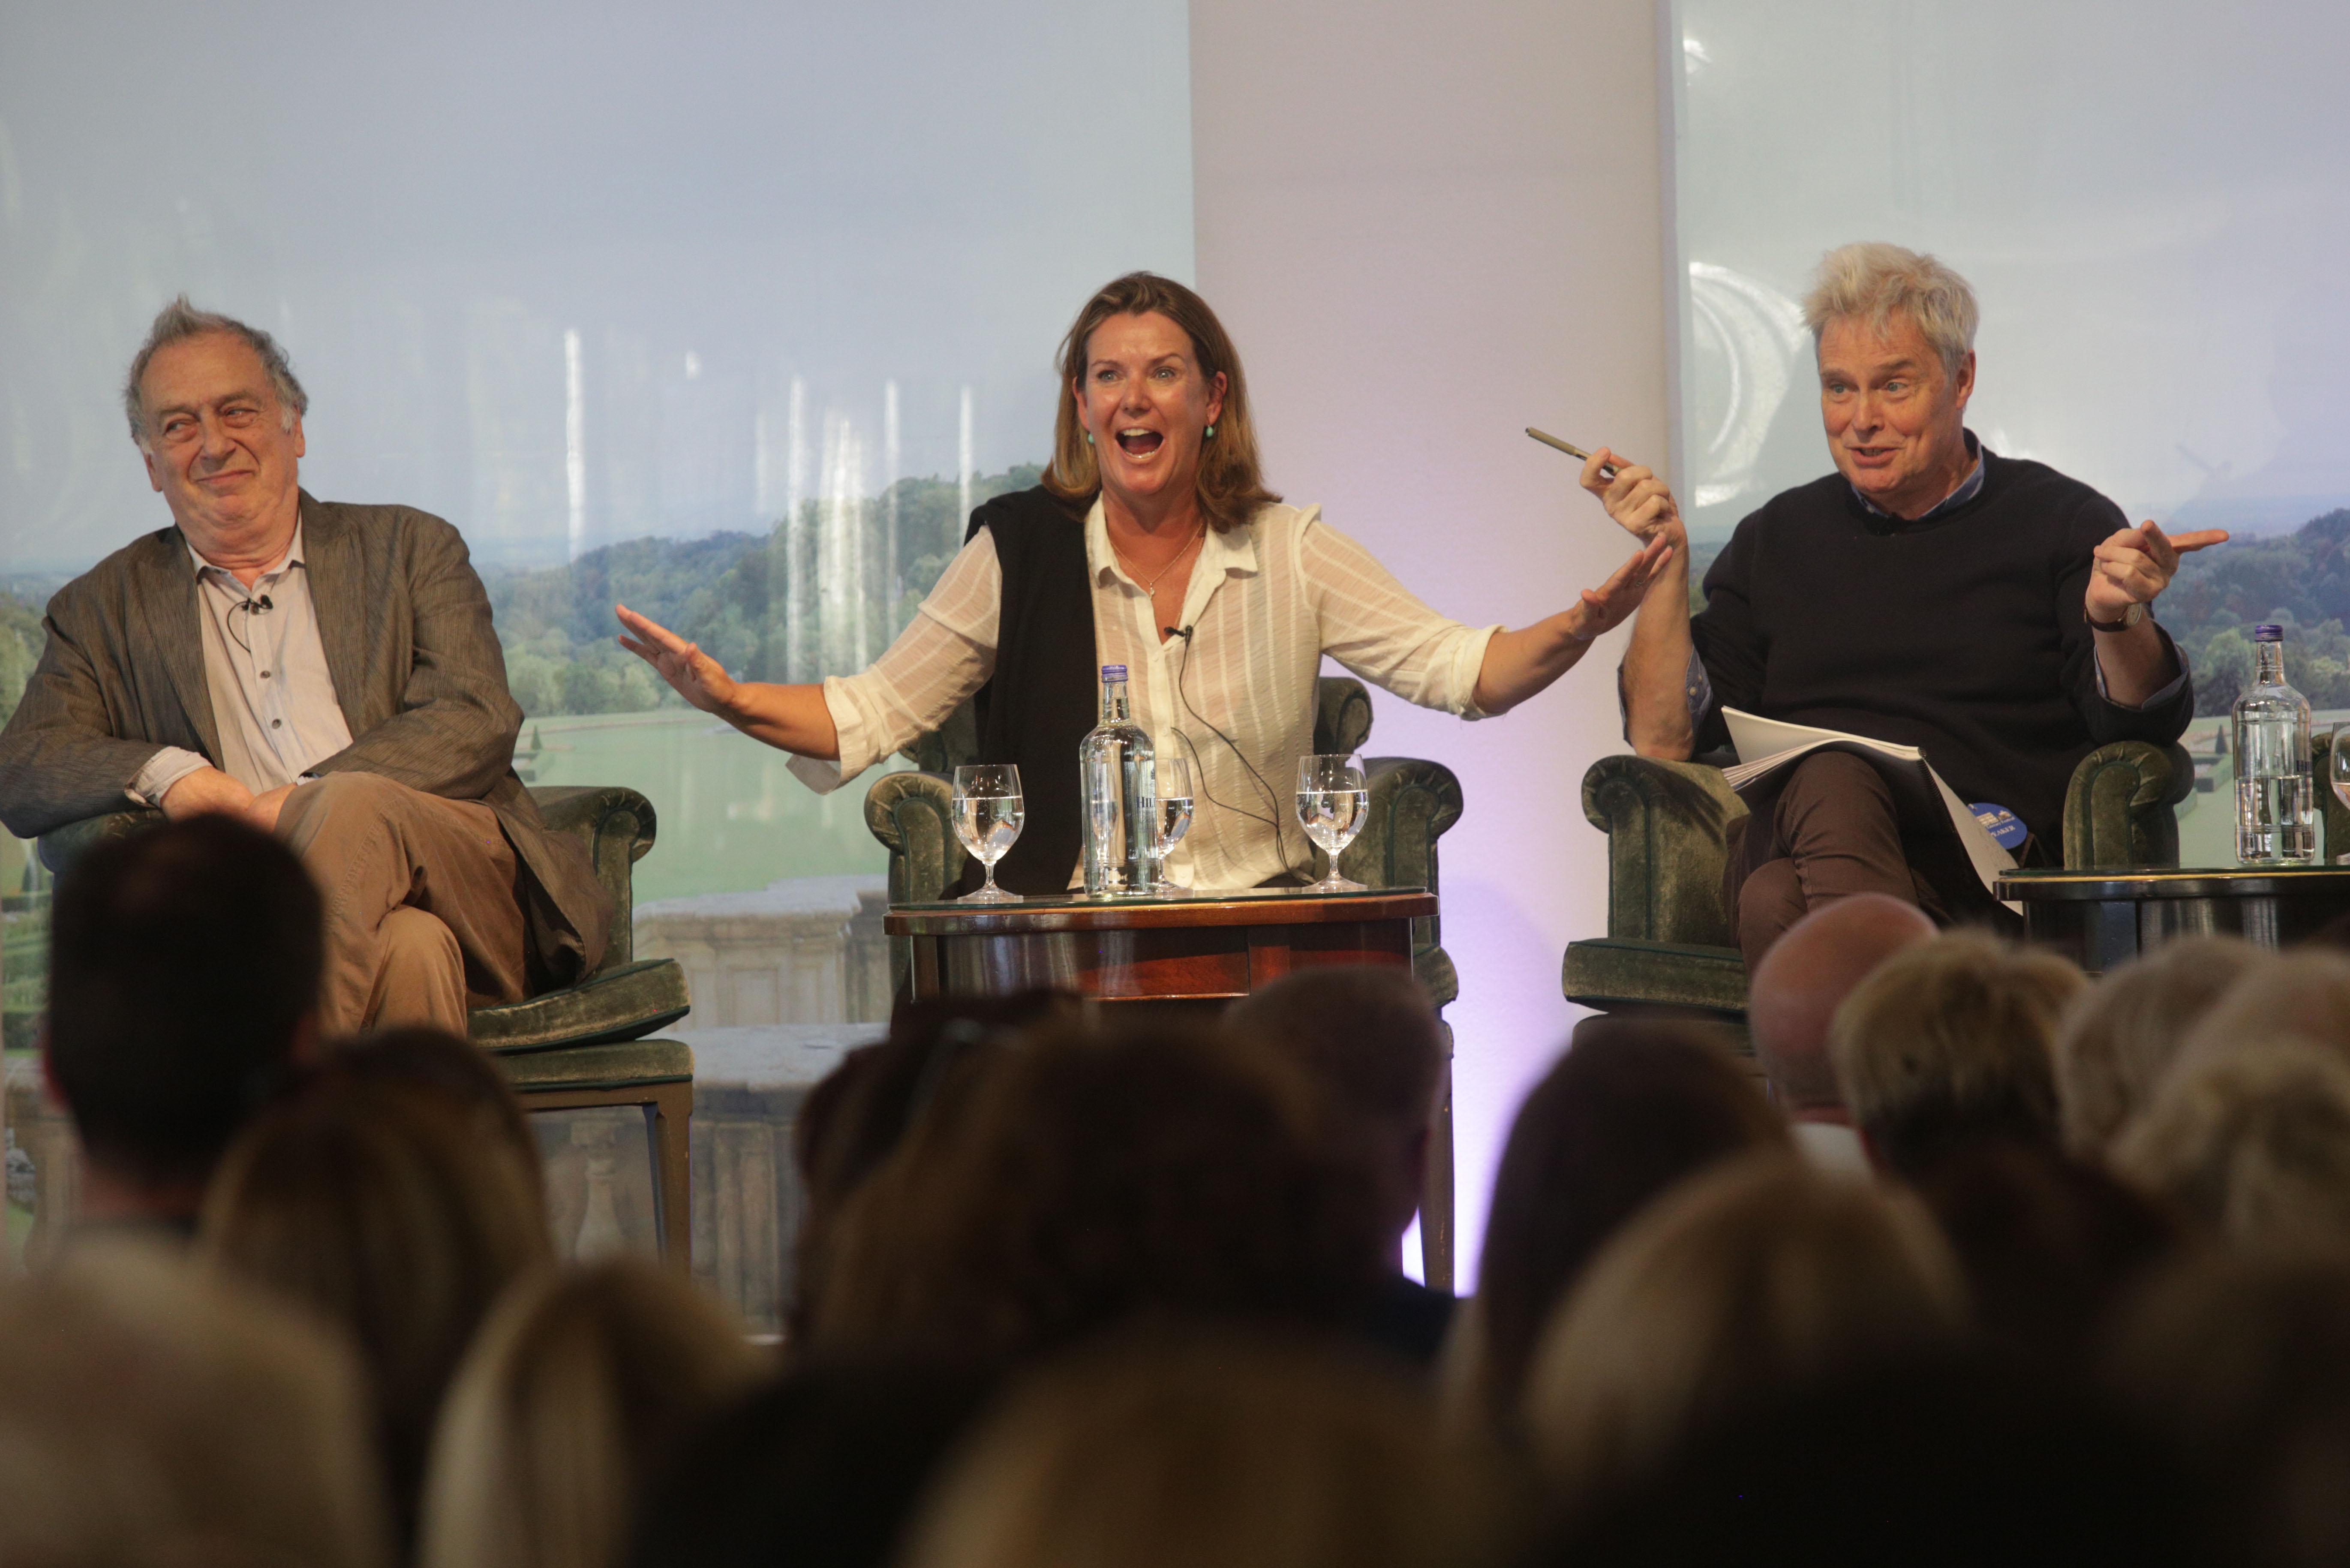 Stephen Frears, Paula Byrne and John Preston at Cliveden Literary Festival